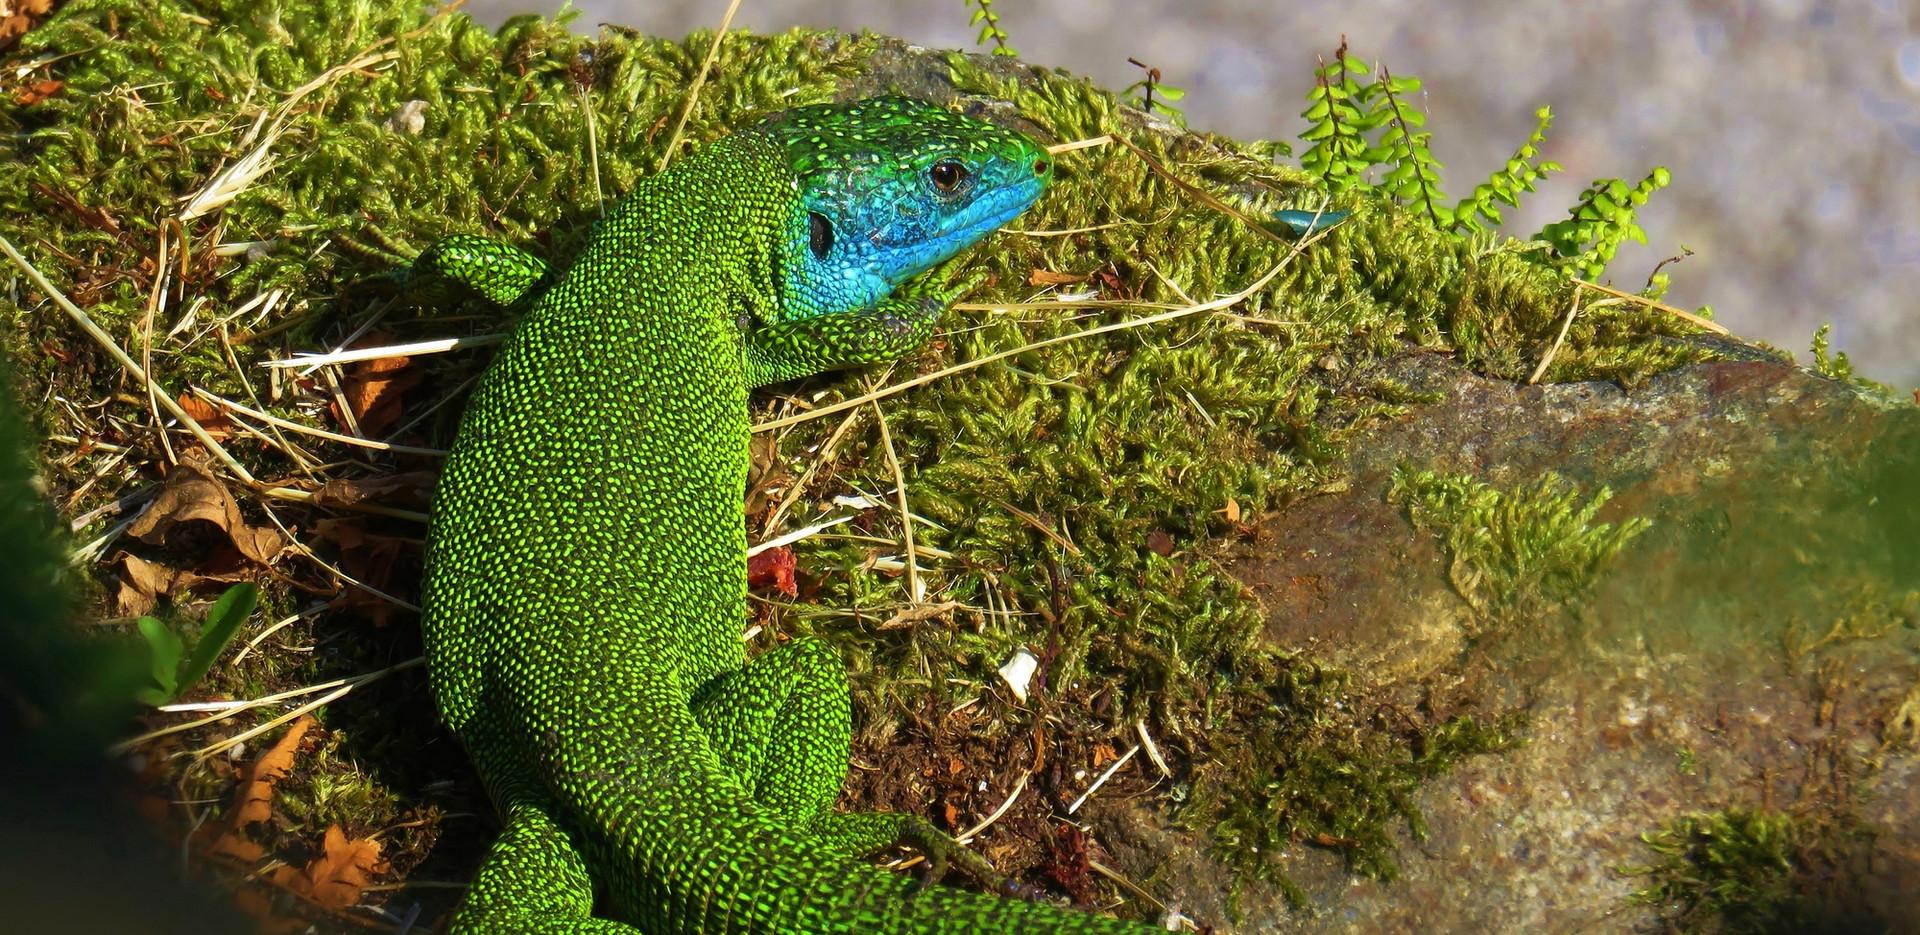 Lézard vert (lacerta bilineata), mâle adulte, Malcantone, Tessin, mai 2020.jpg